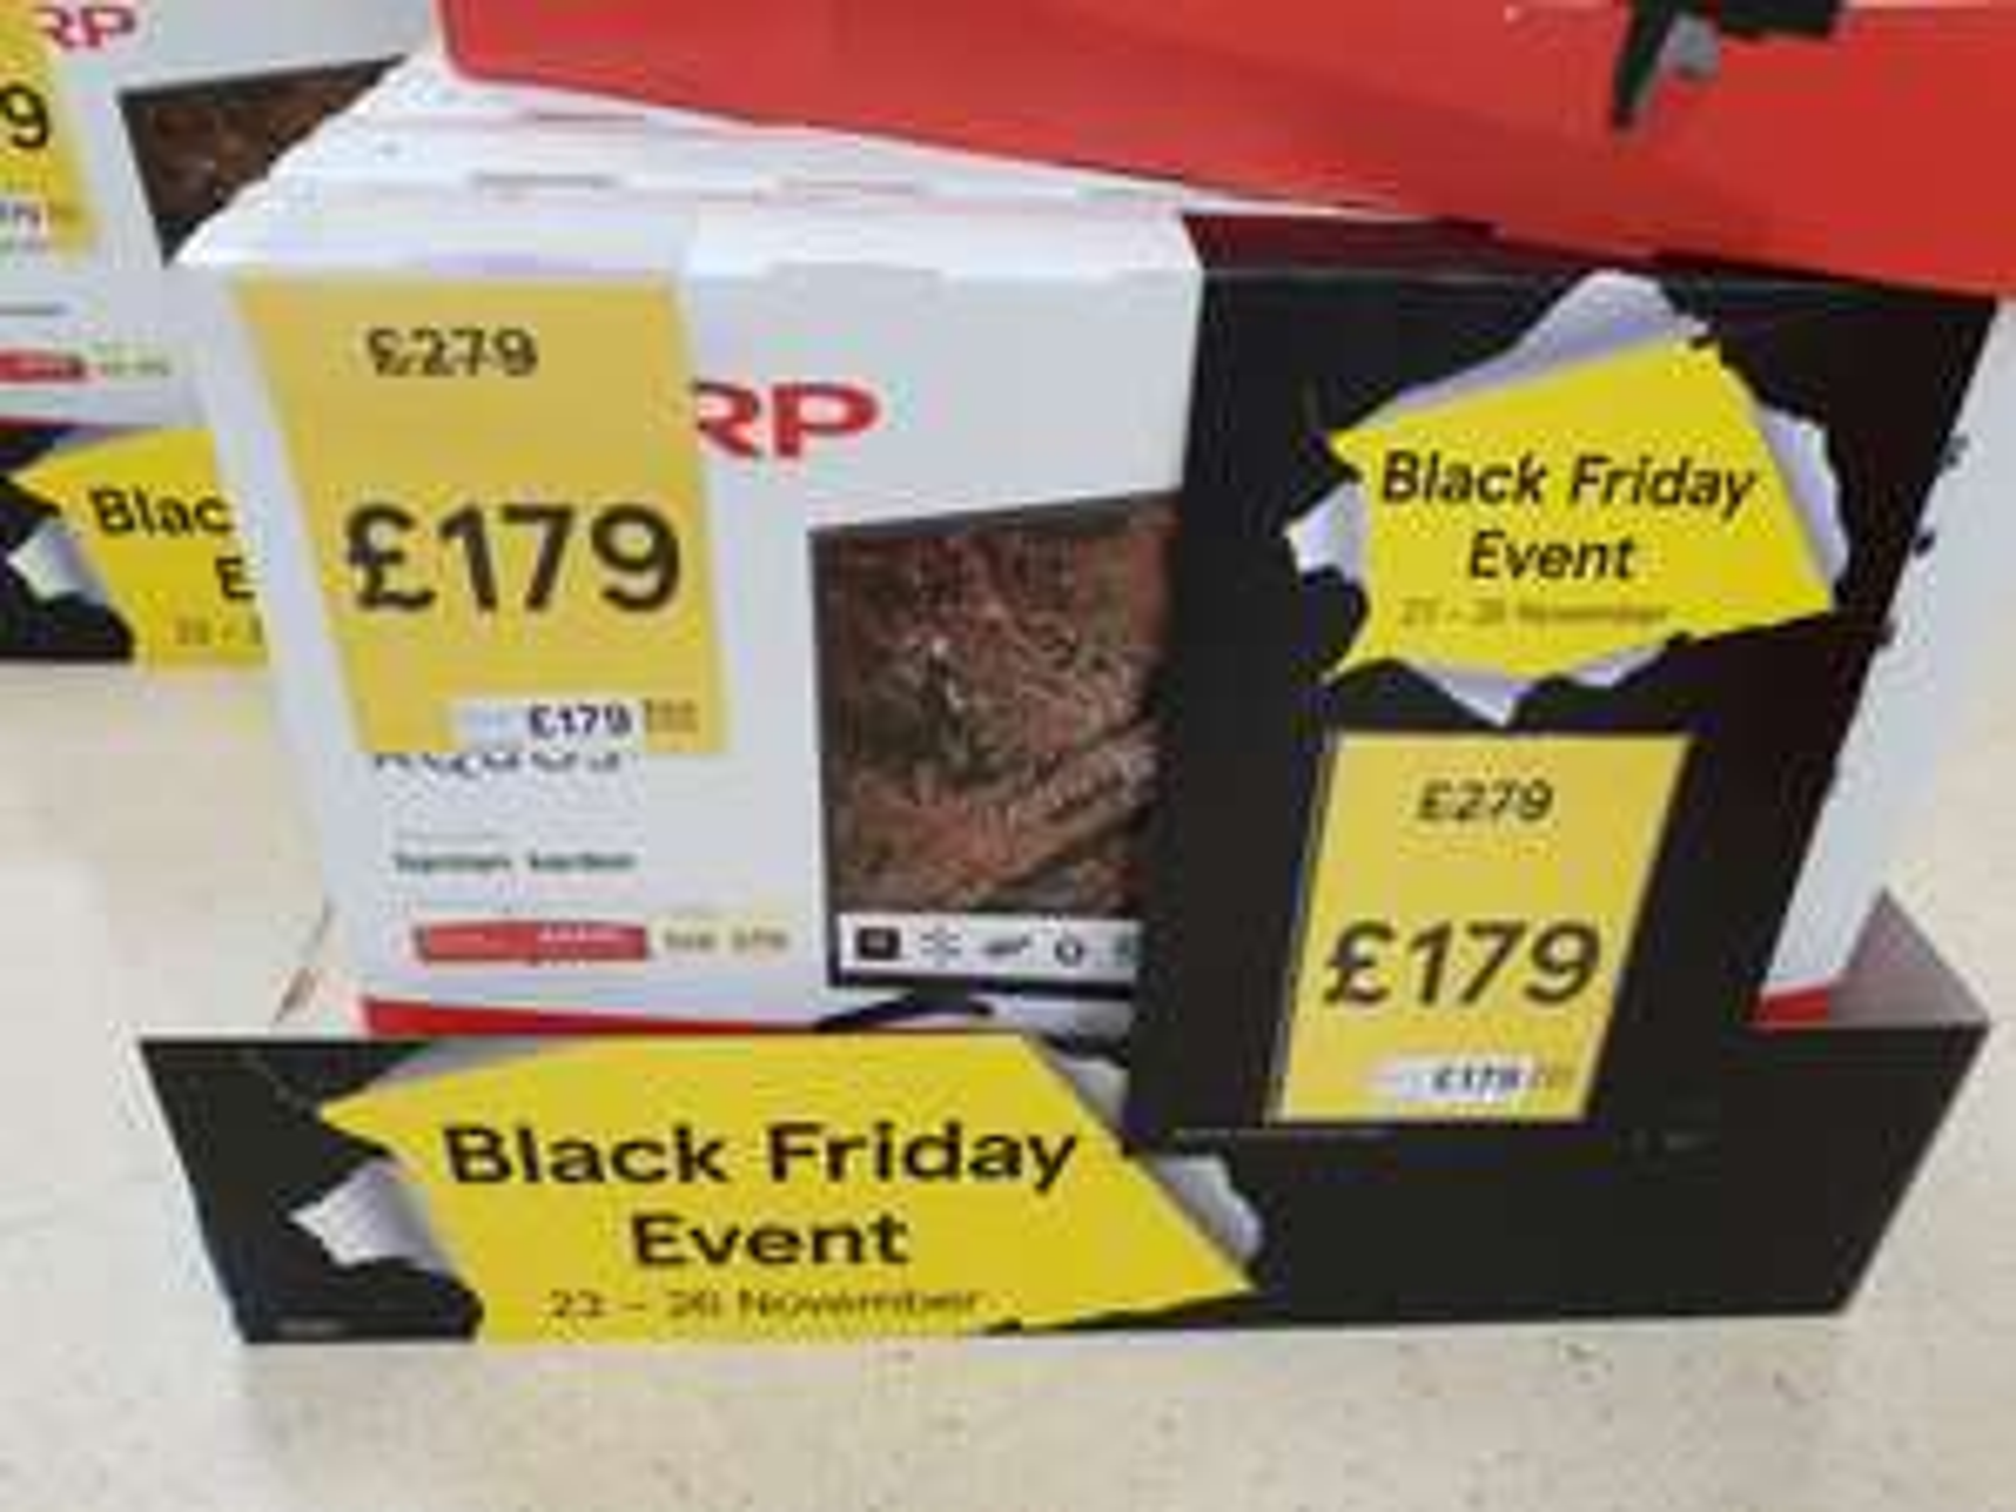 TESCO Black Friday 40 inch Sharp TV - £179